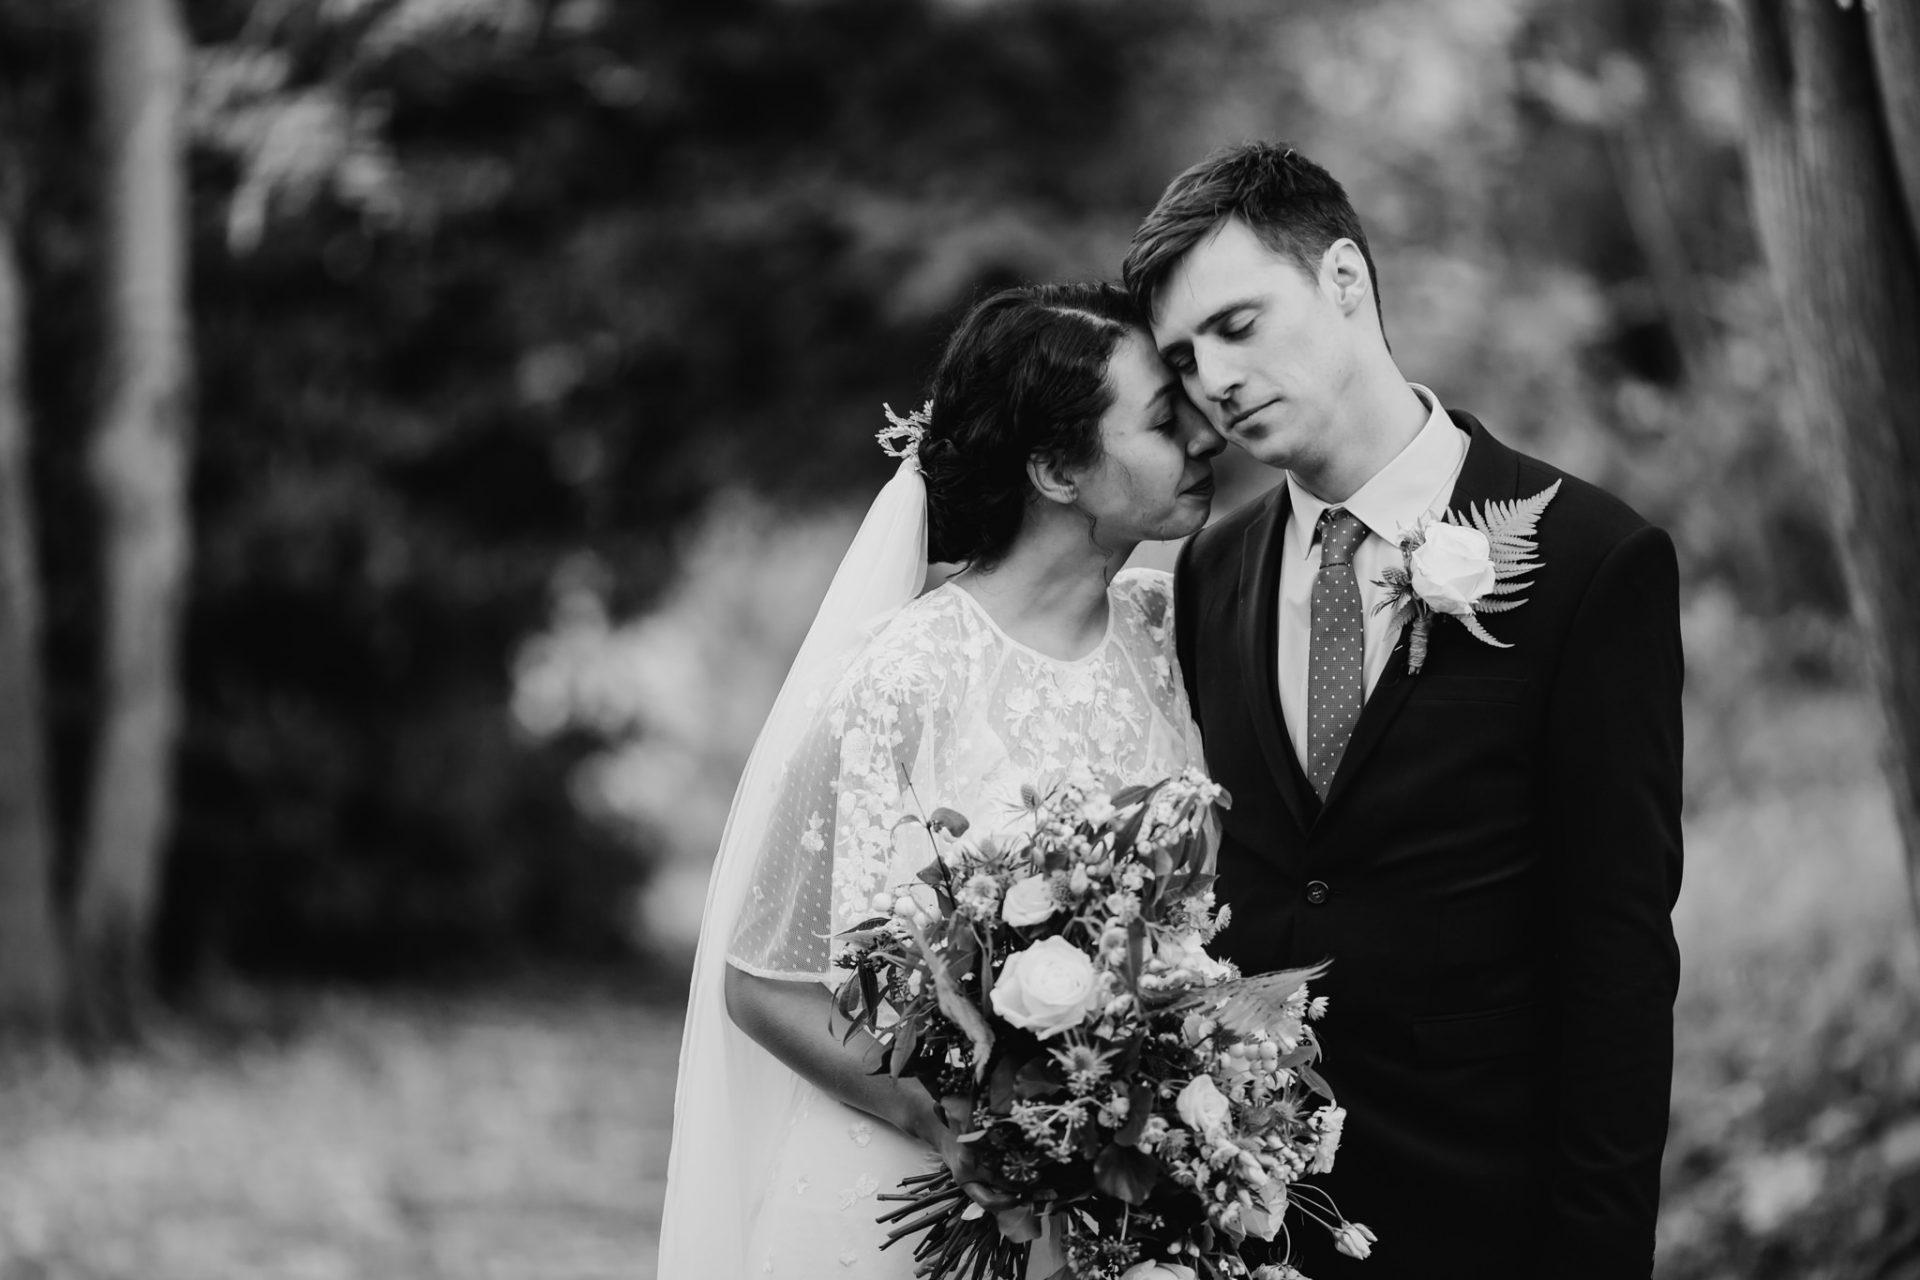 bride and groom emotional wedding portrait